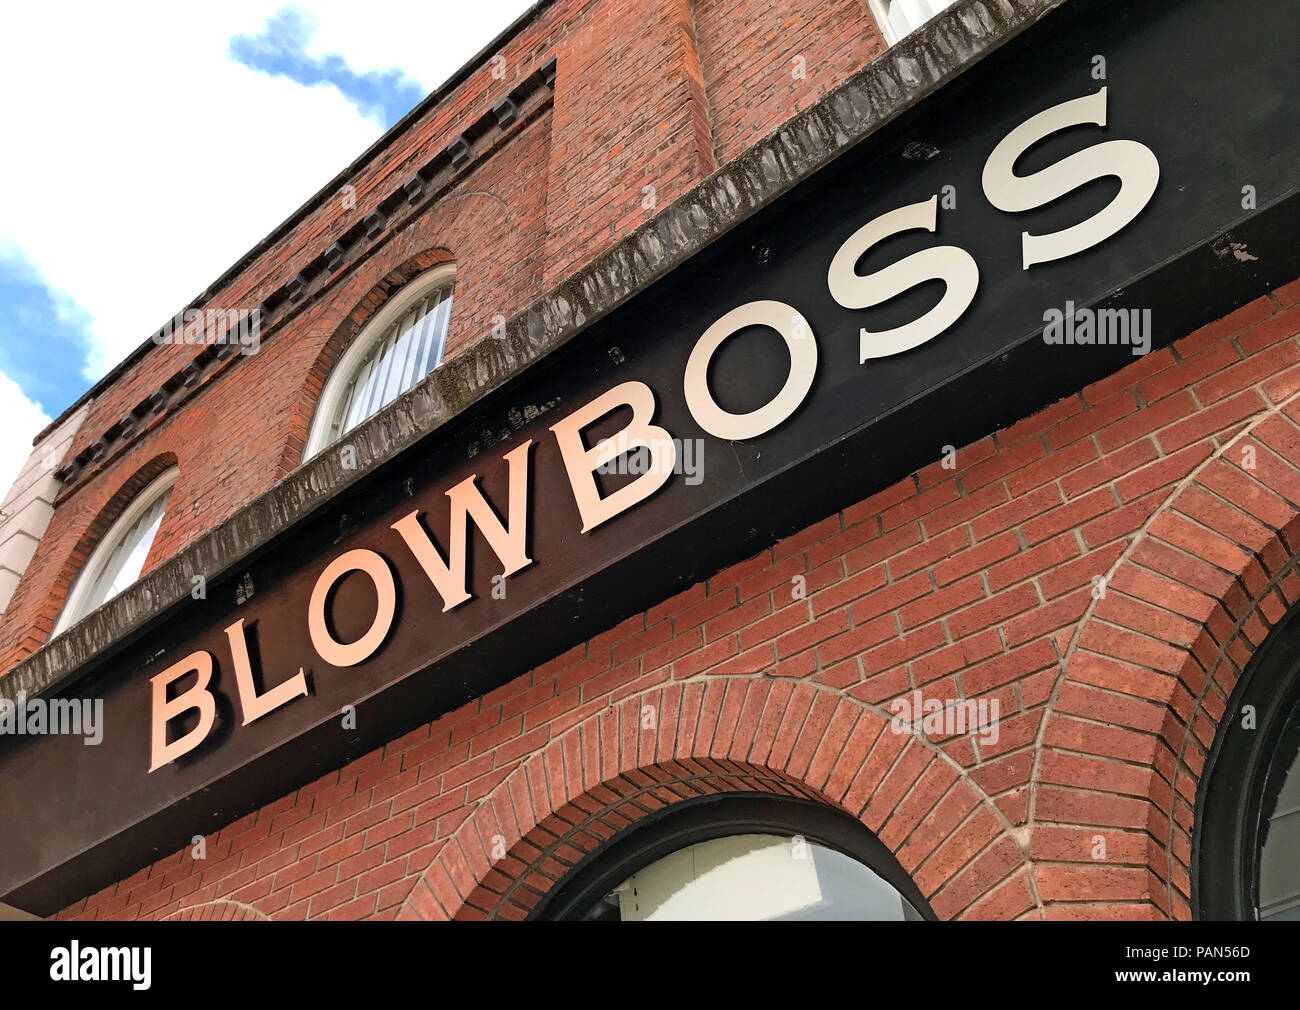 @HotpixUK,GoTonySmith,Blowjob,blow